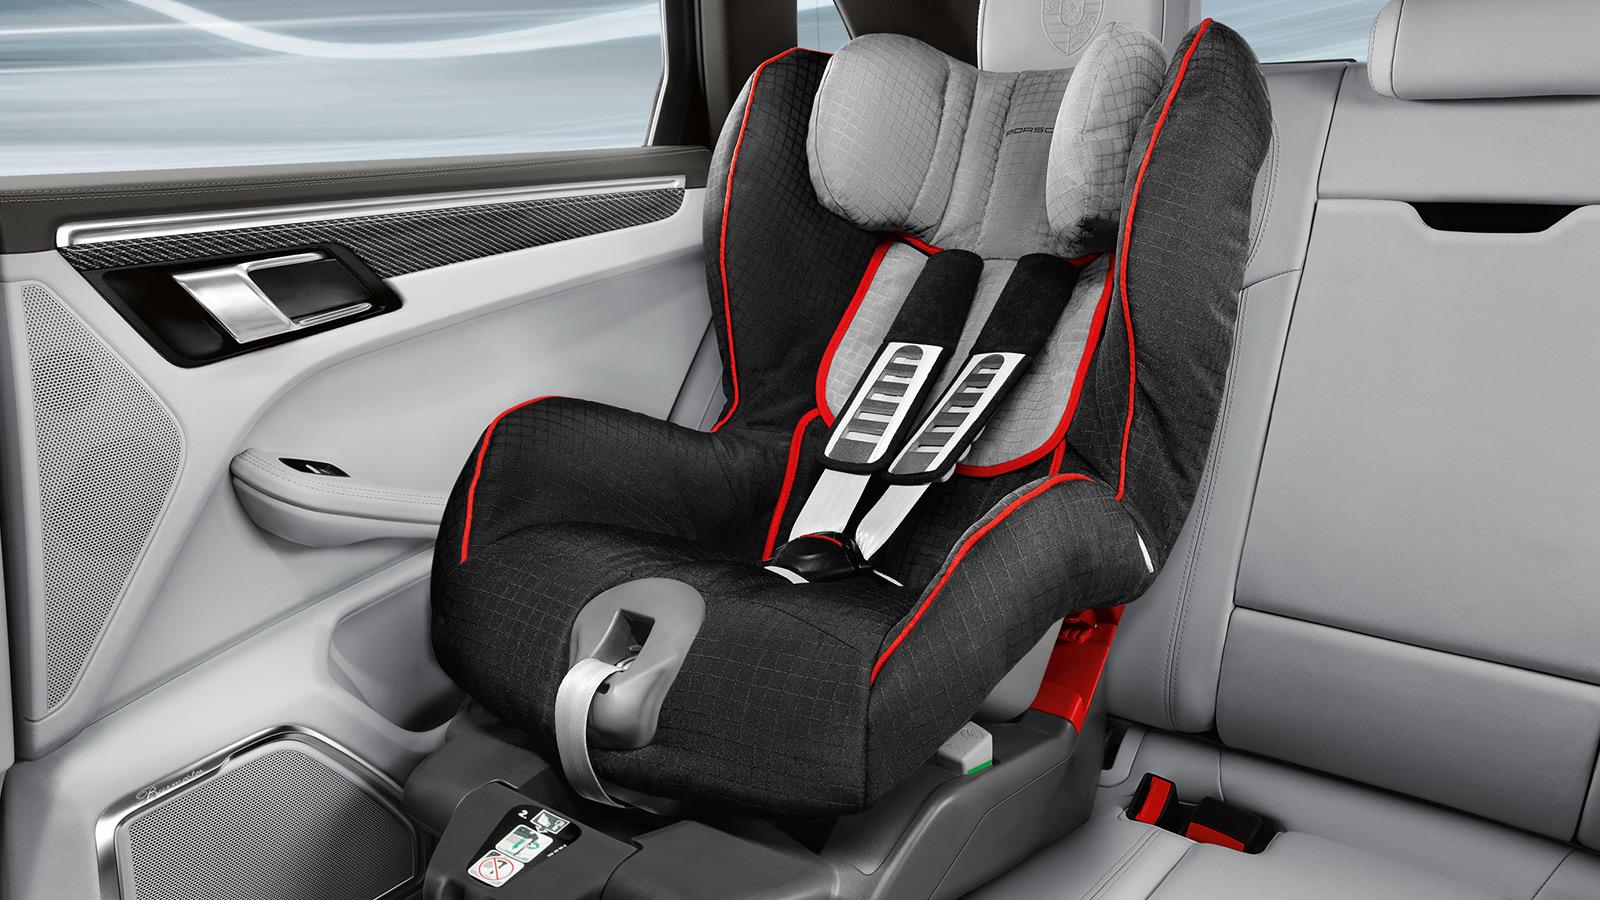 Porsche - Детские кресла